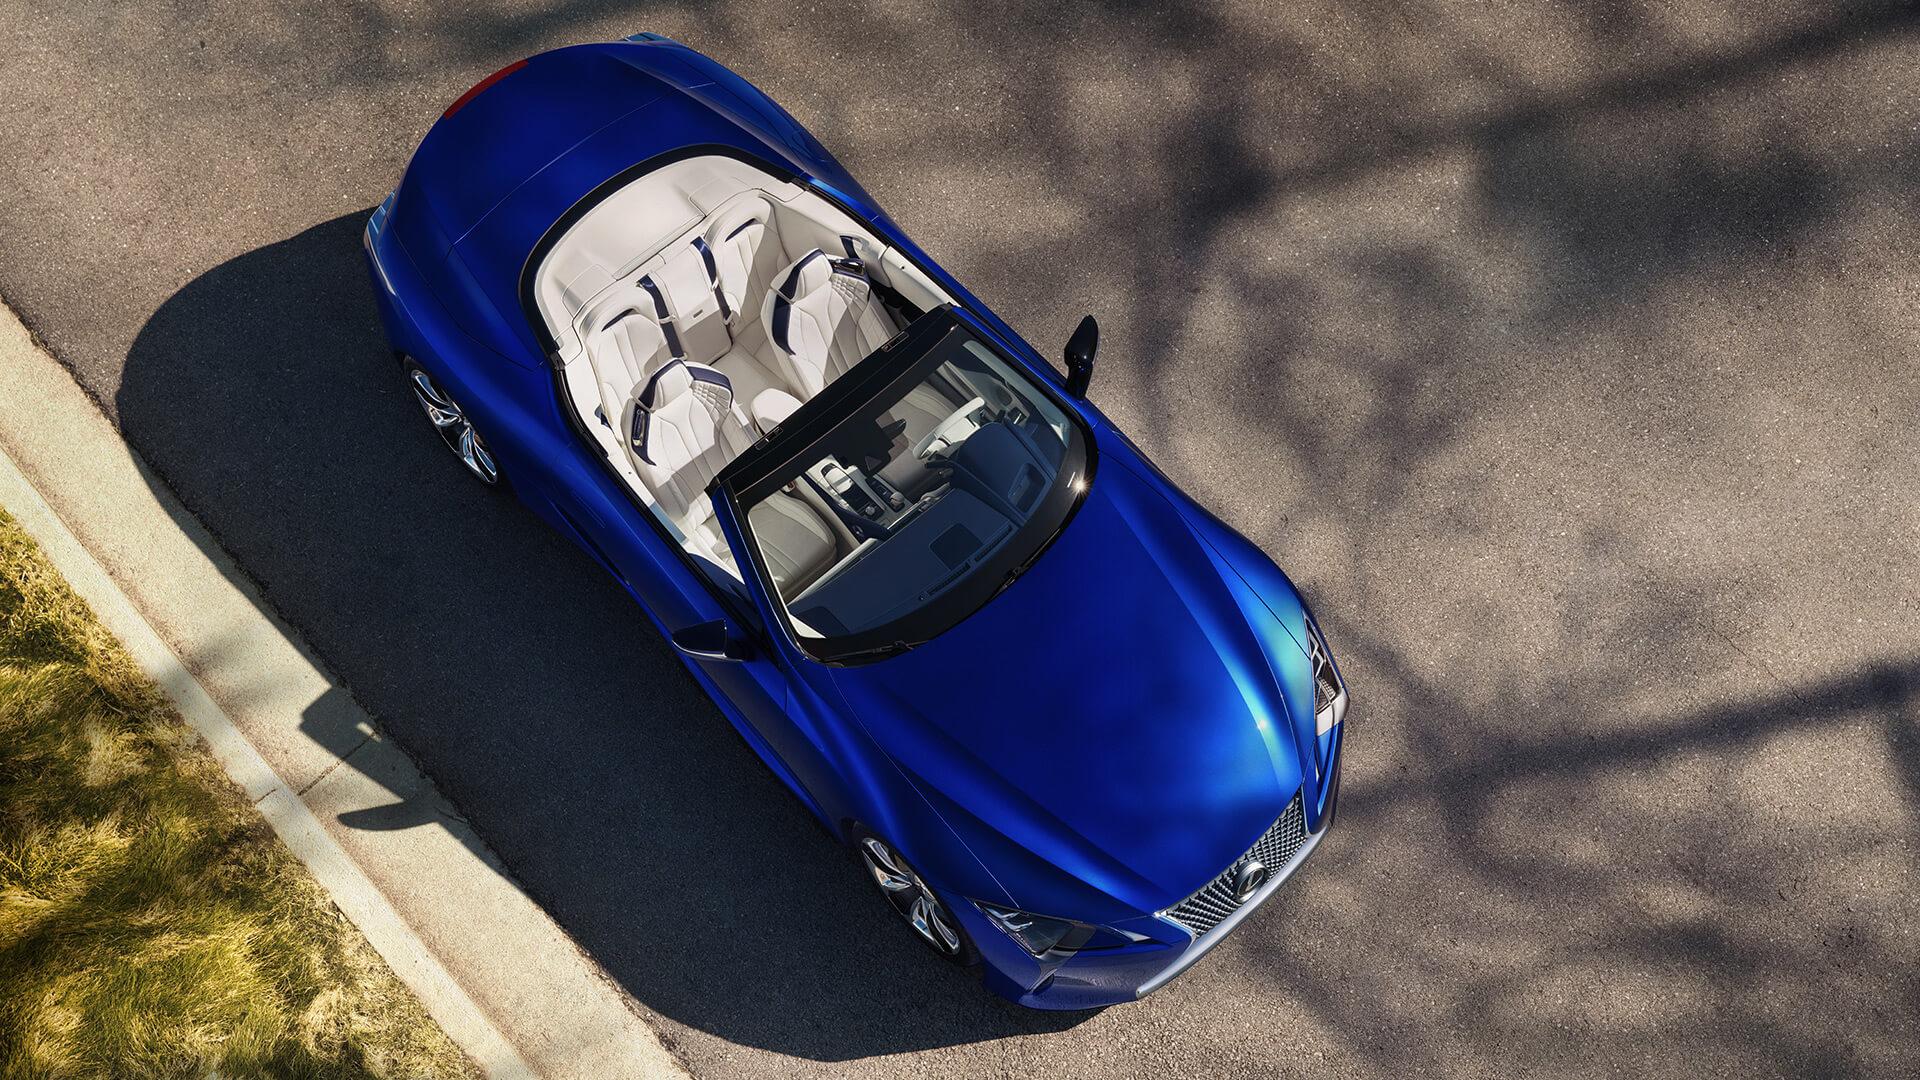 2019 lexus lc convertible 08